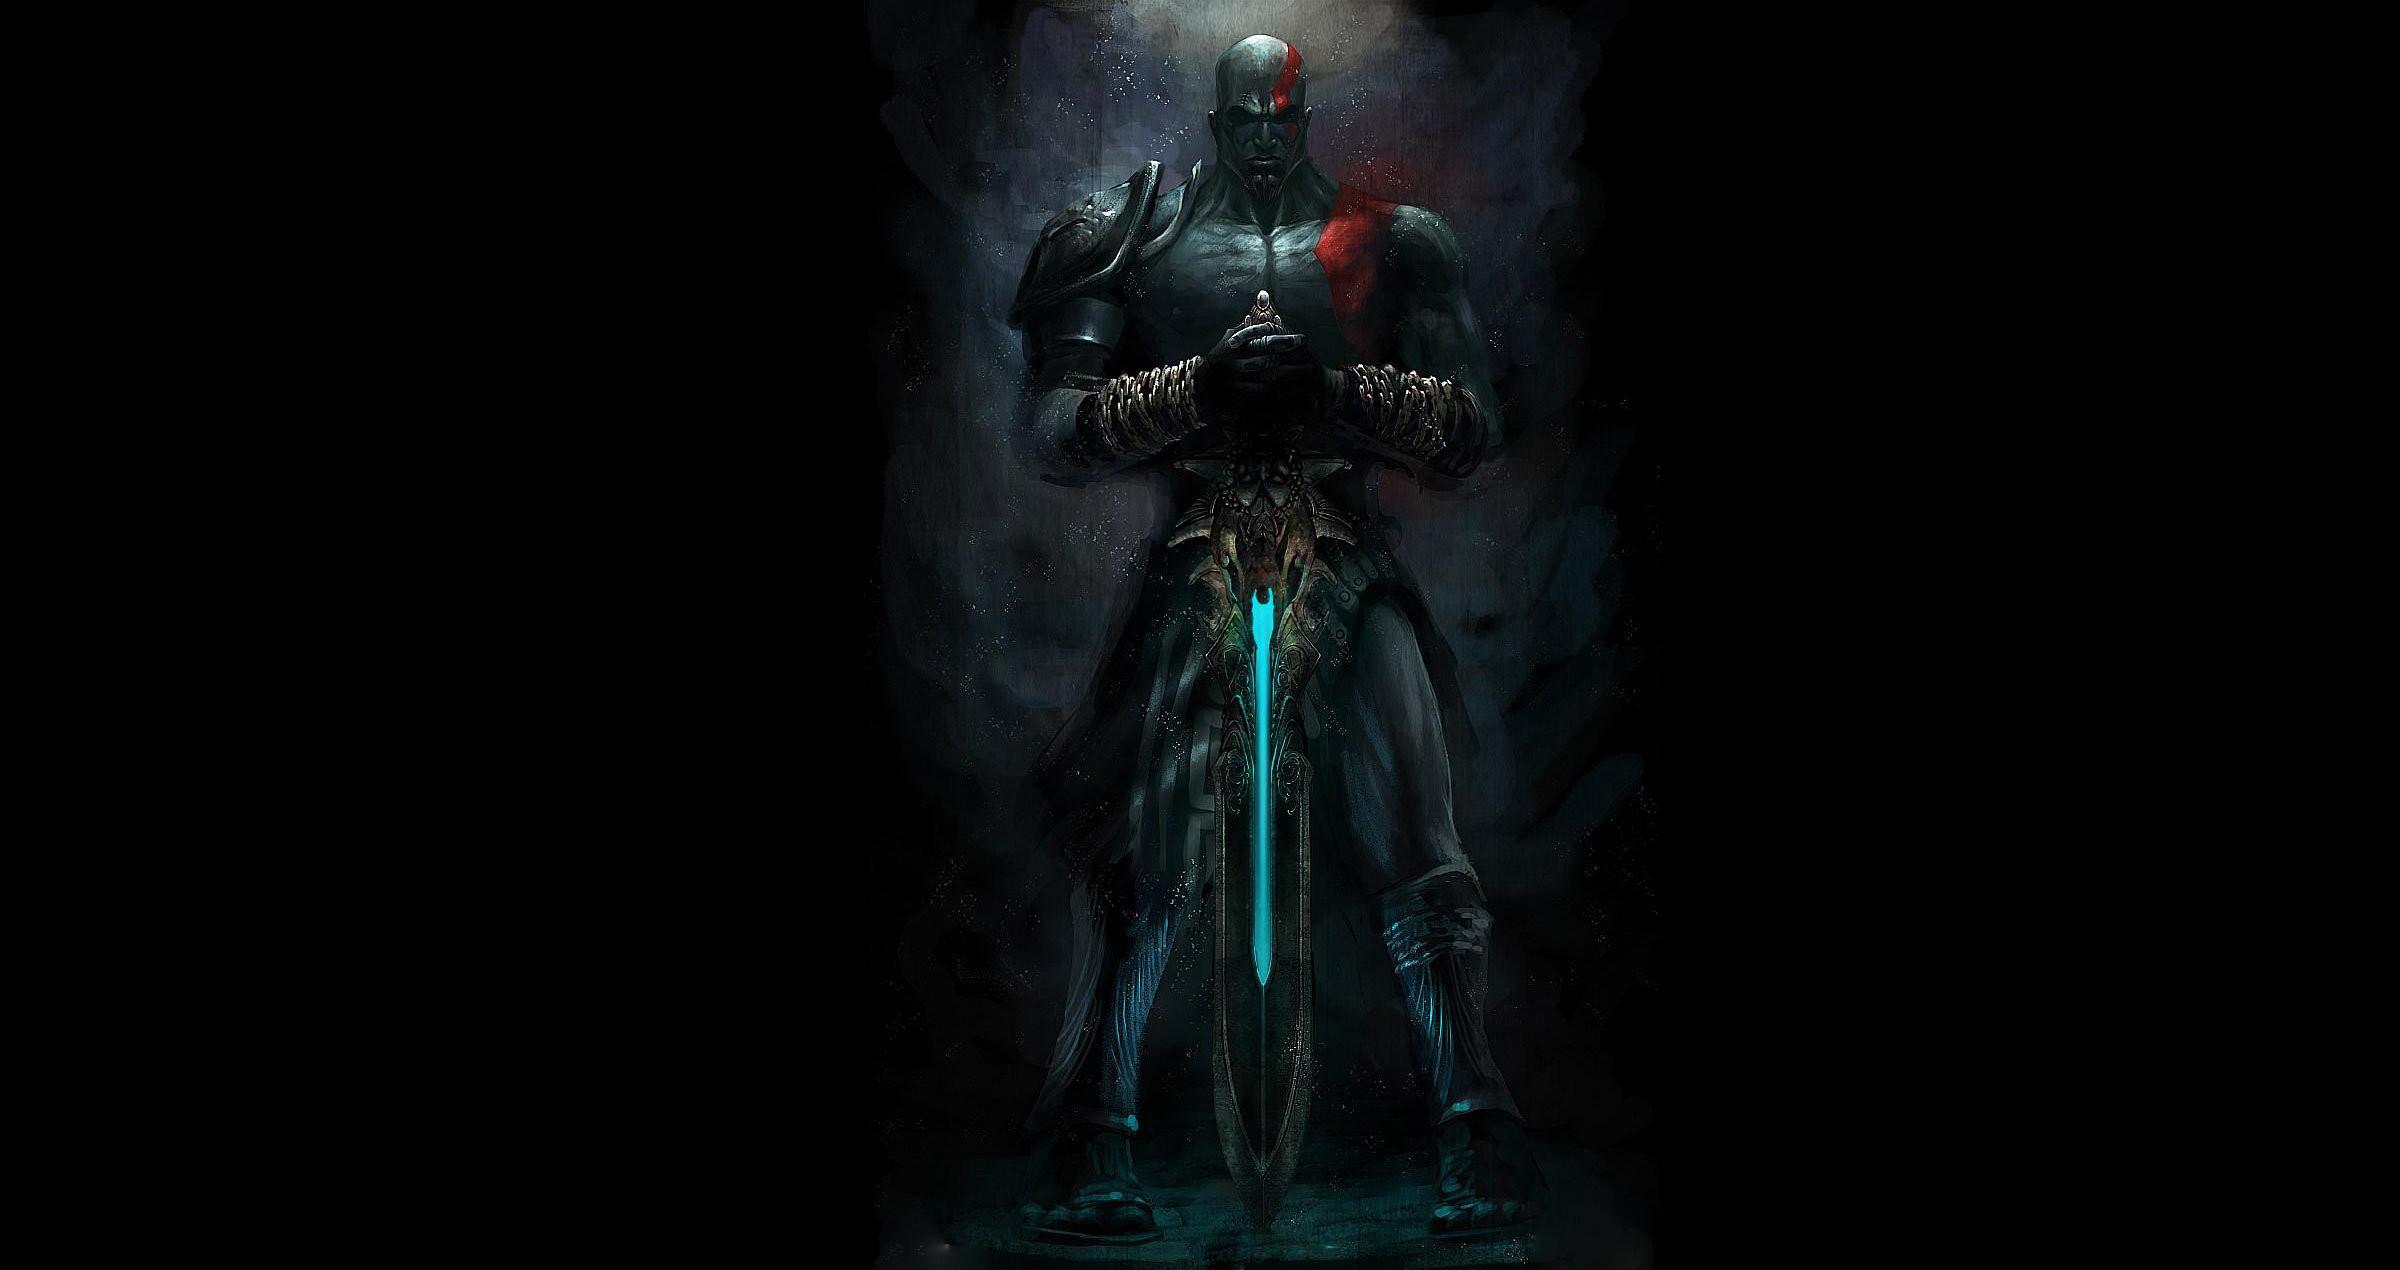 God of War 3 Wallpaper HD ·â'